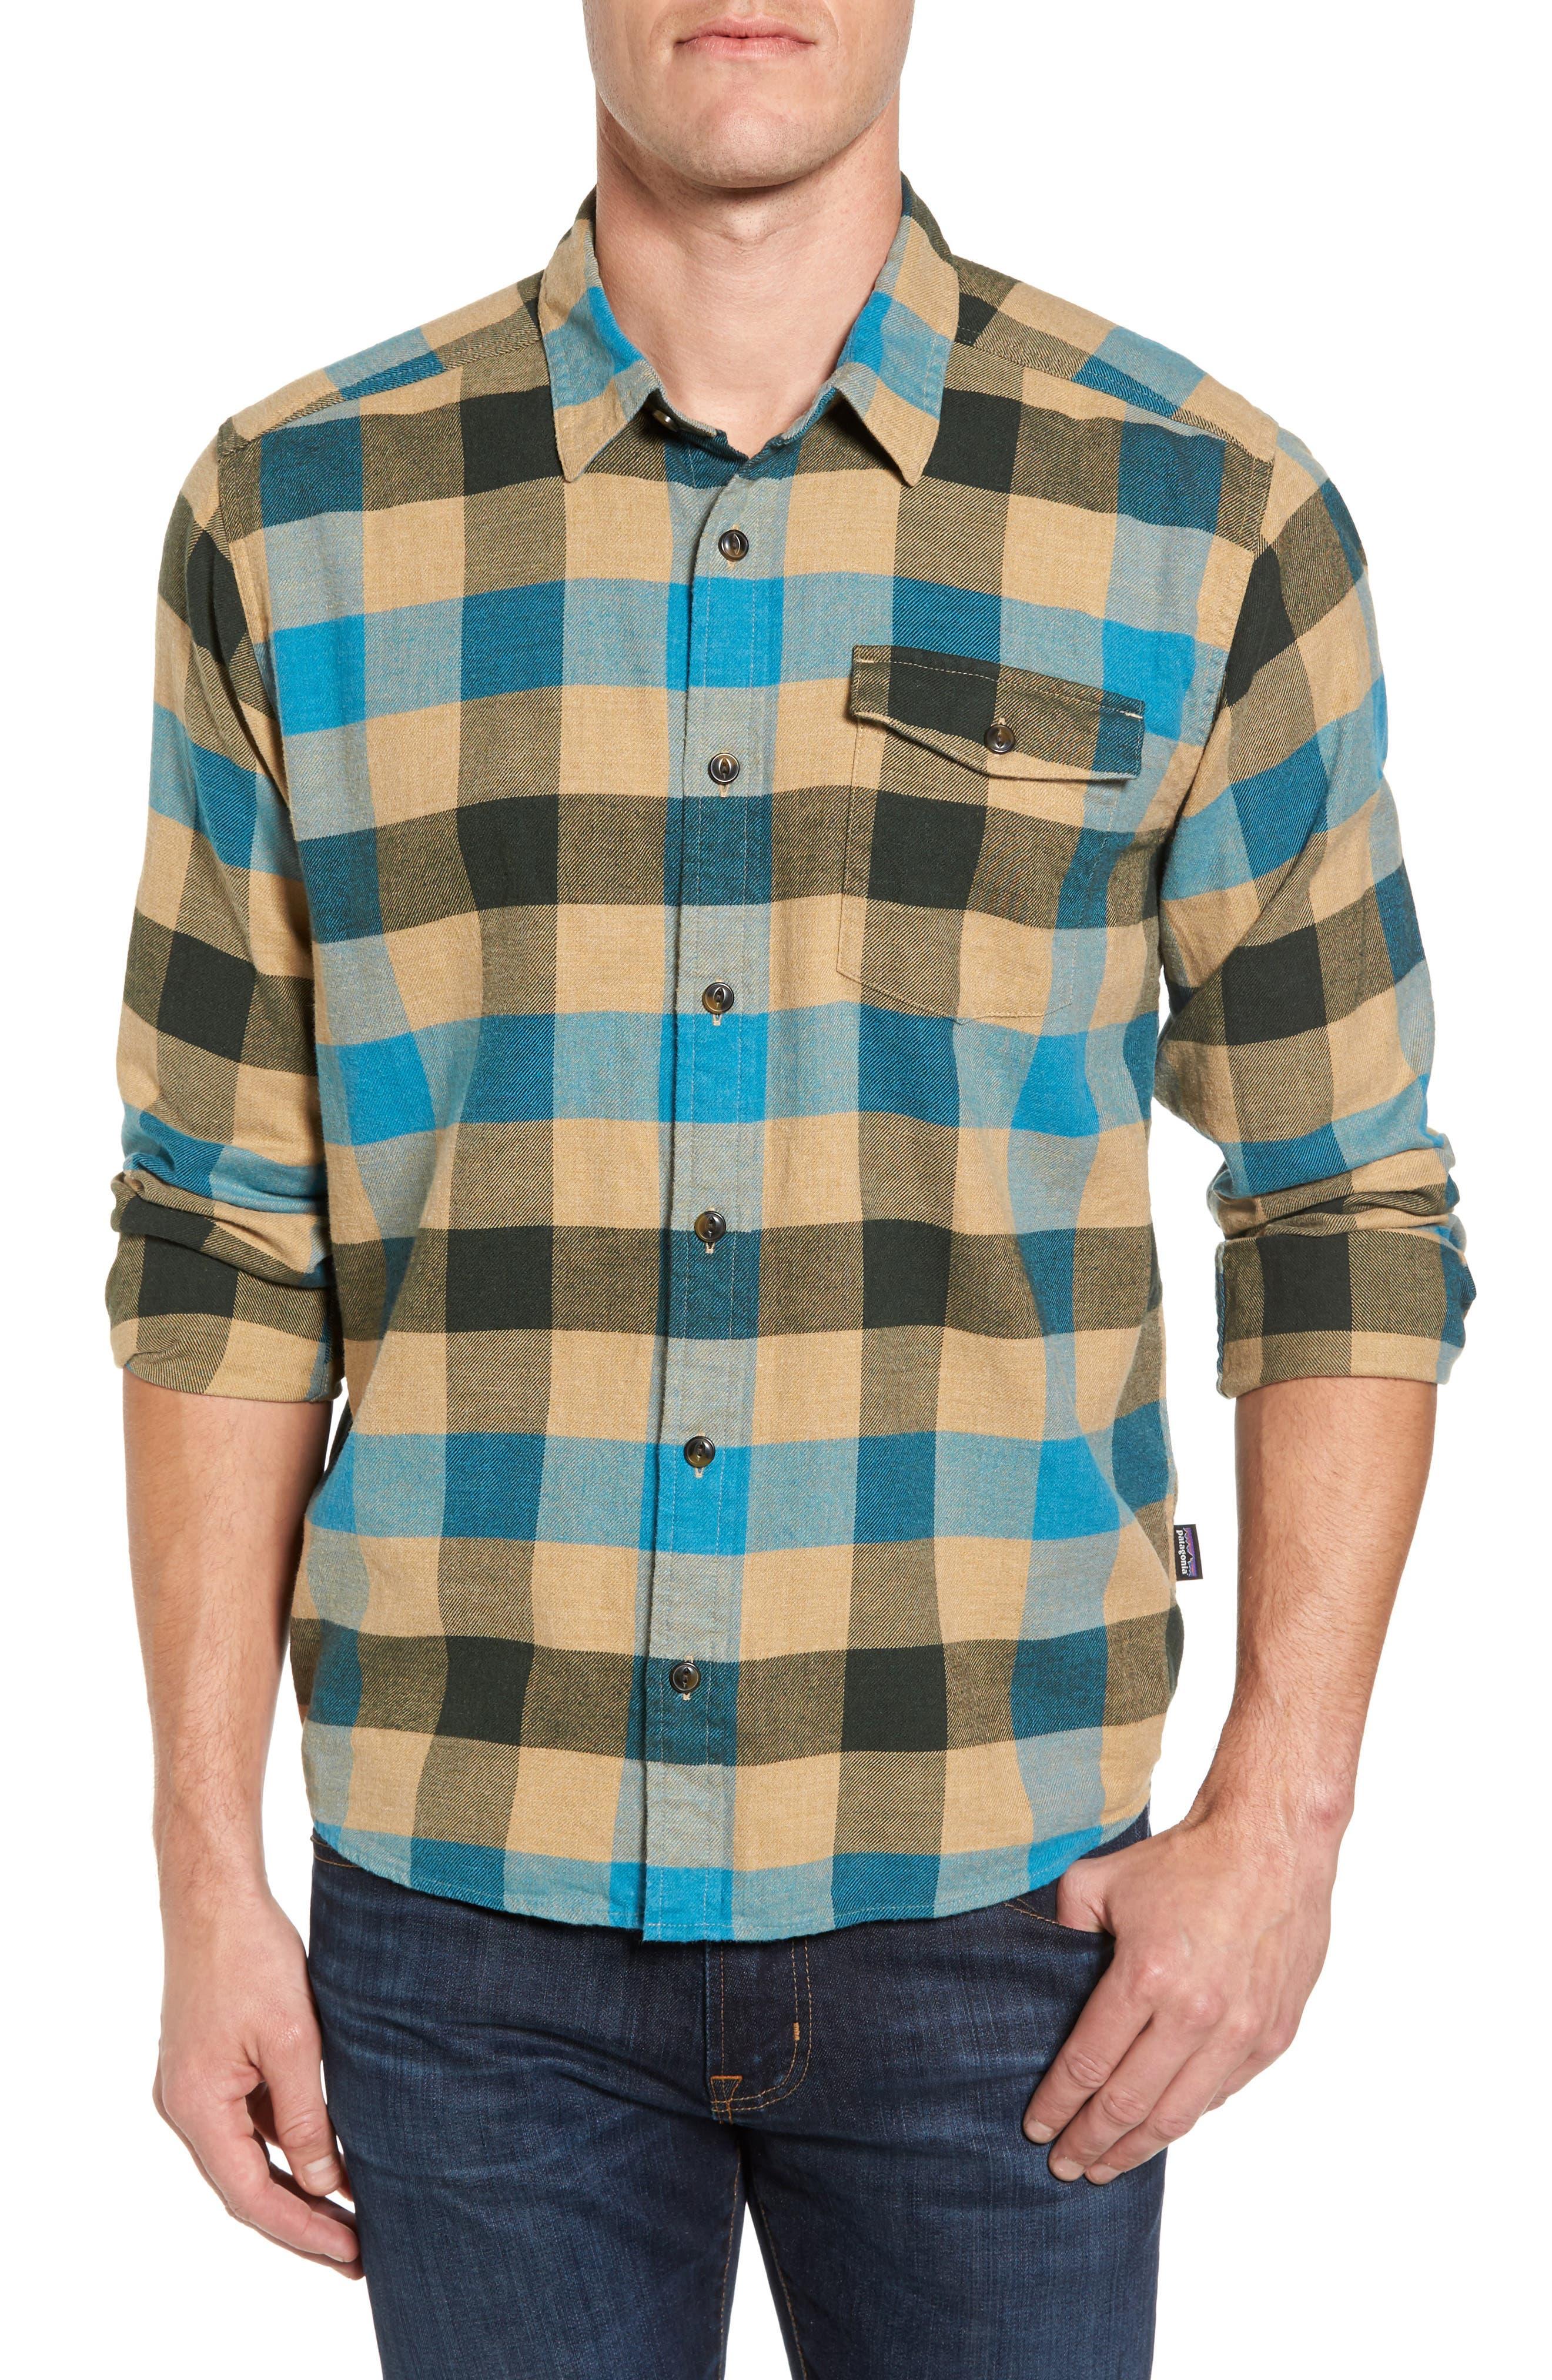 Alternate Image 1 Selected - Patagonia Regular Fit Organic Cotton Flannel Shirt